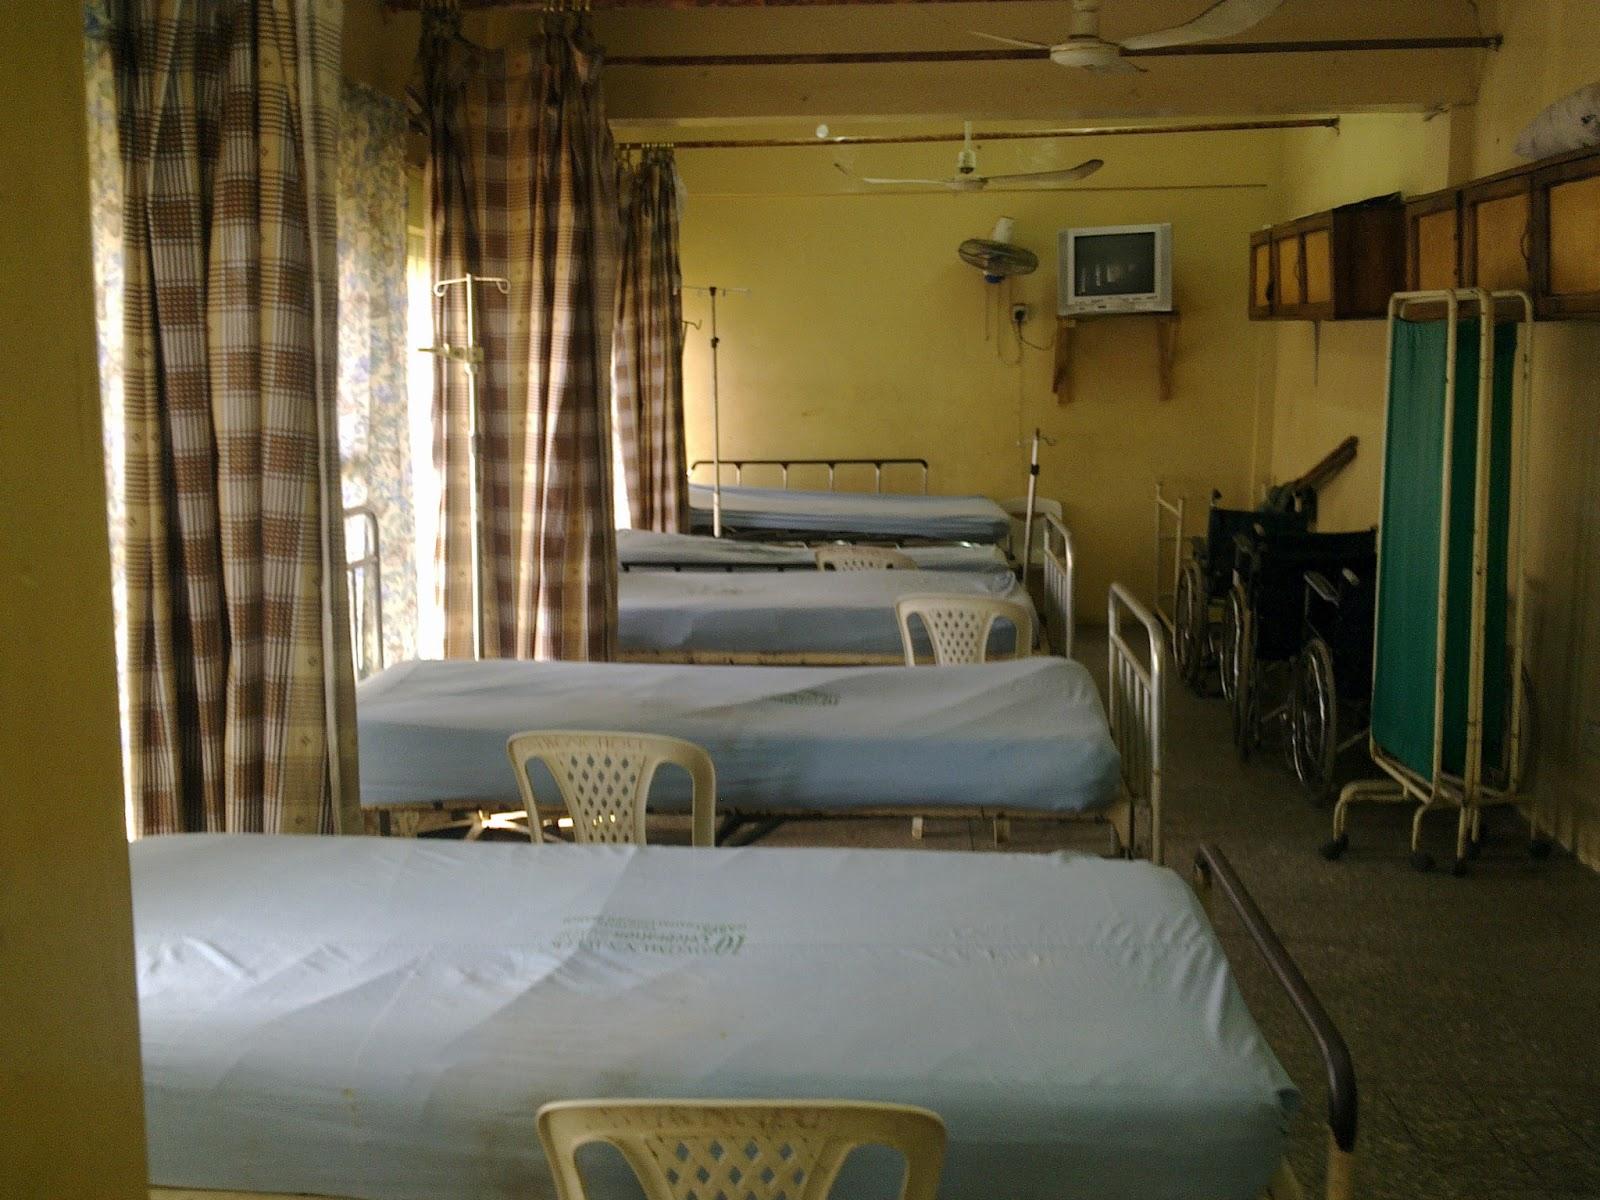 nigerian doctors strike